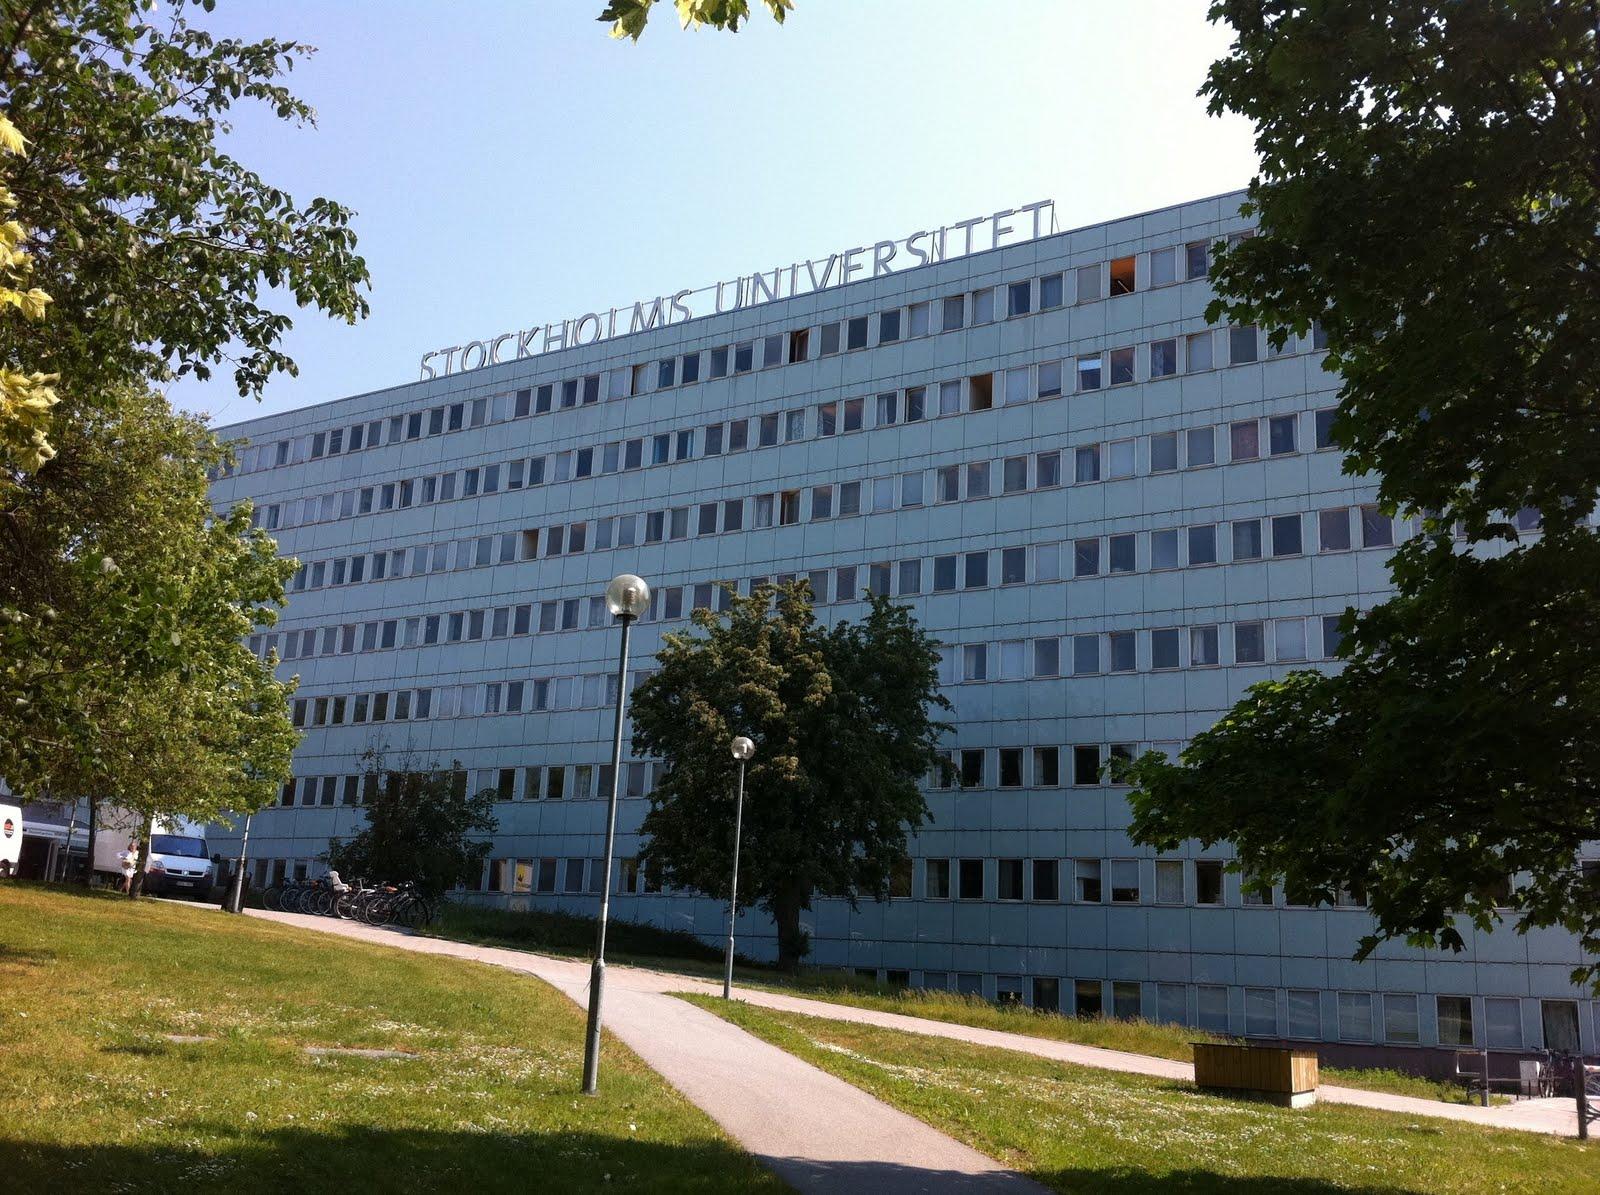 Stockholms University